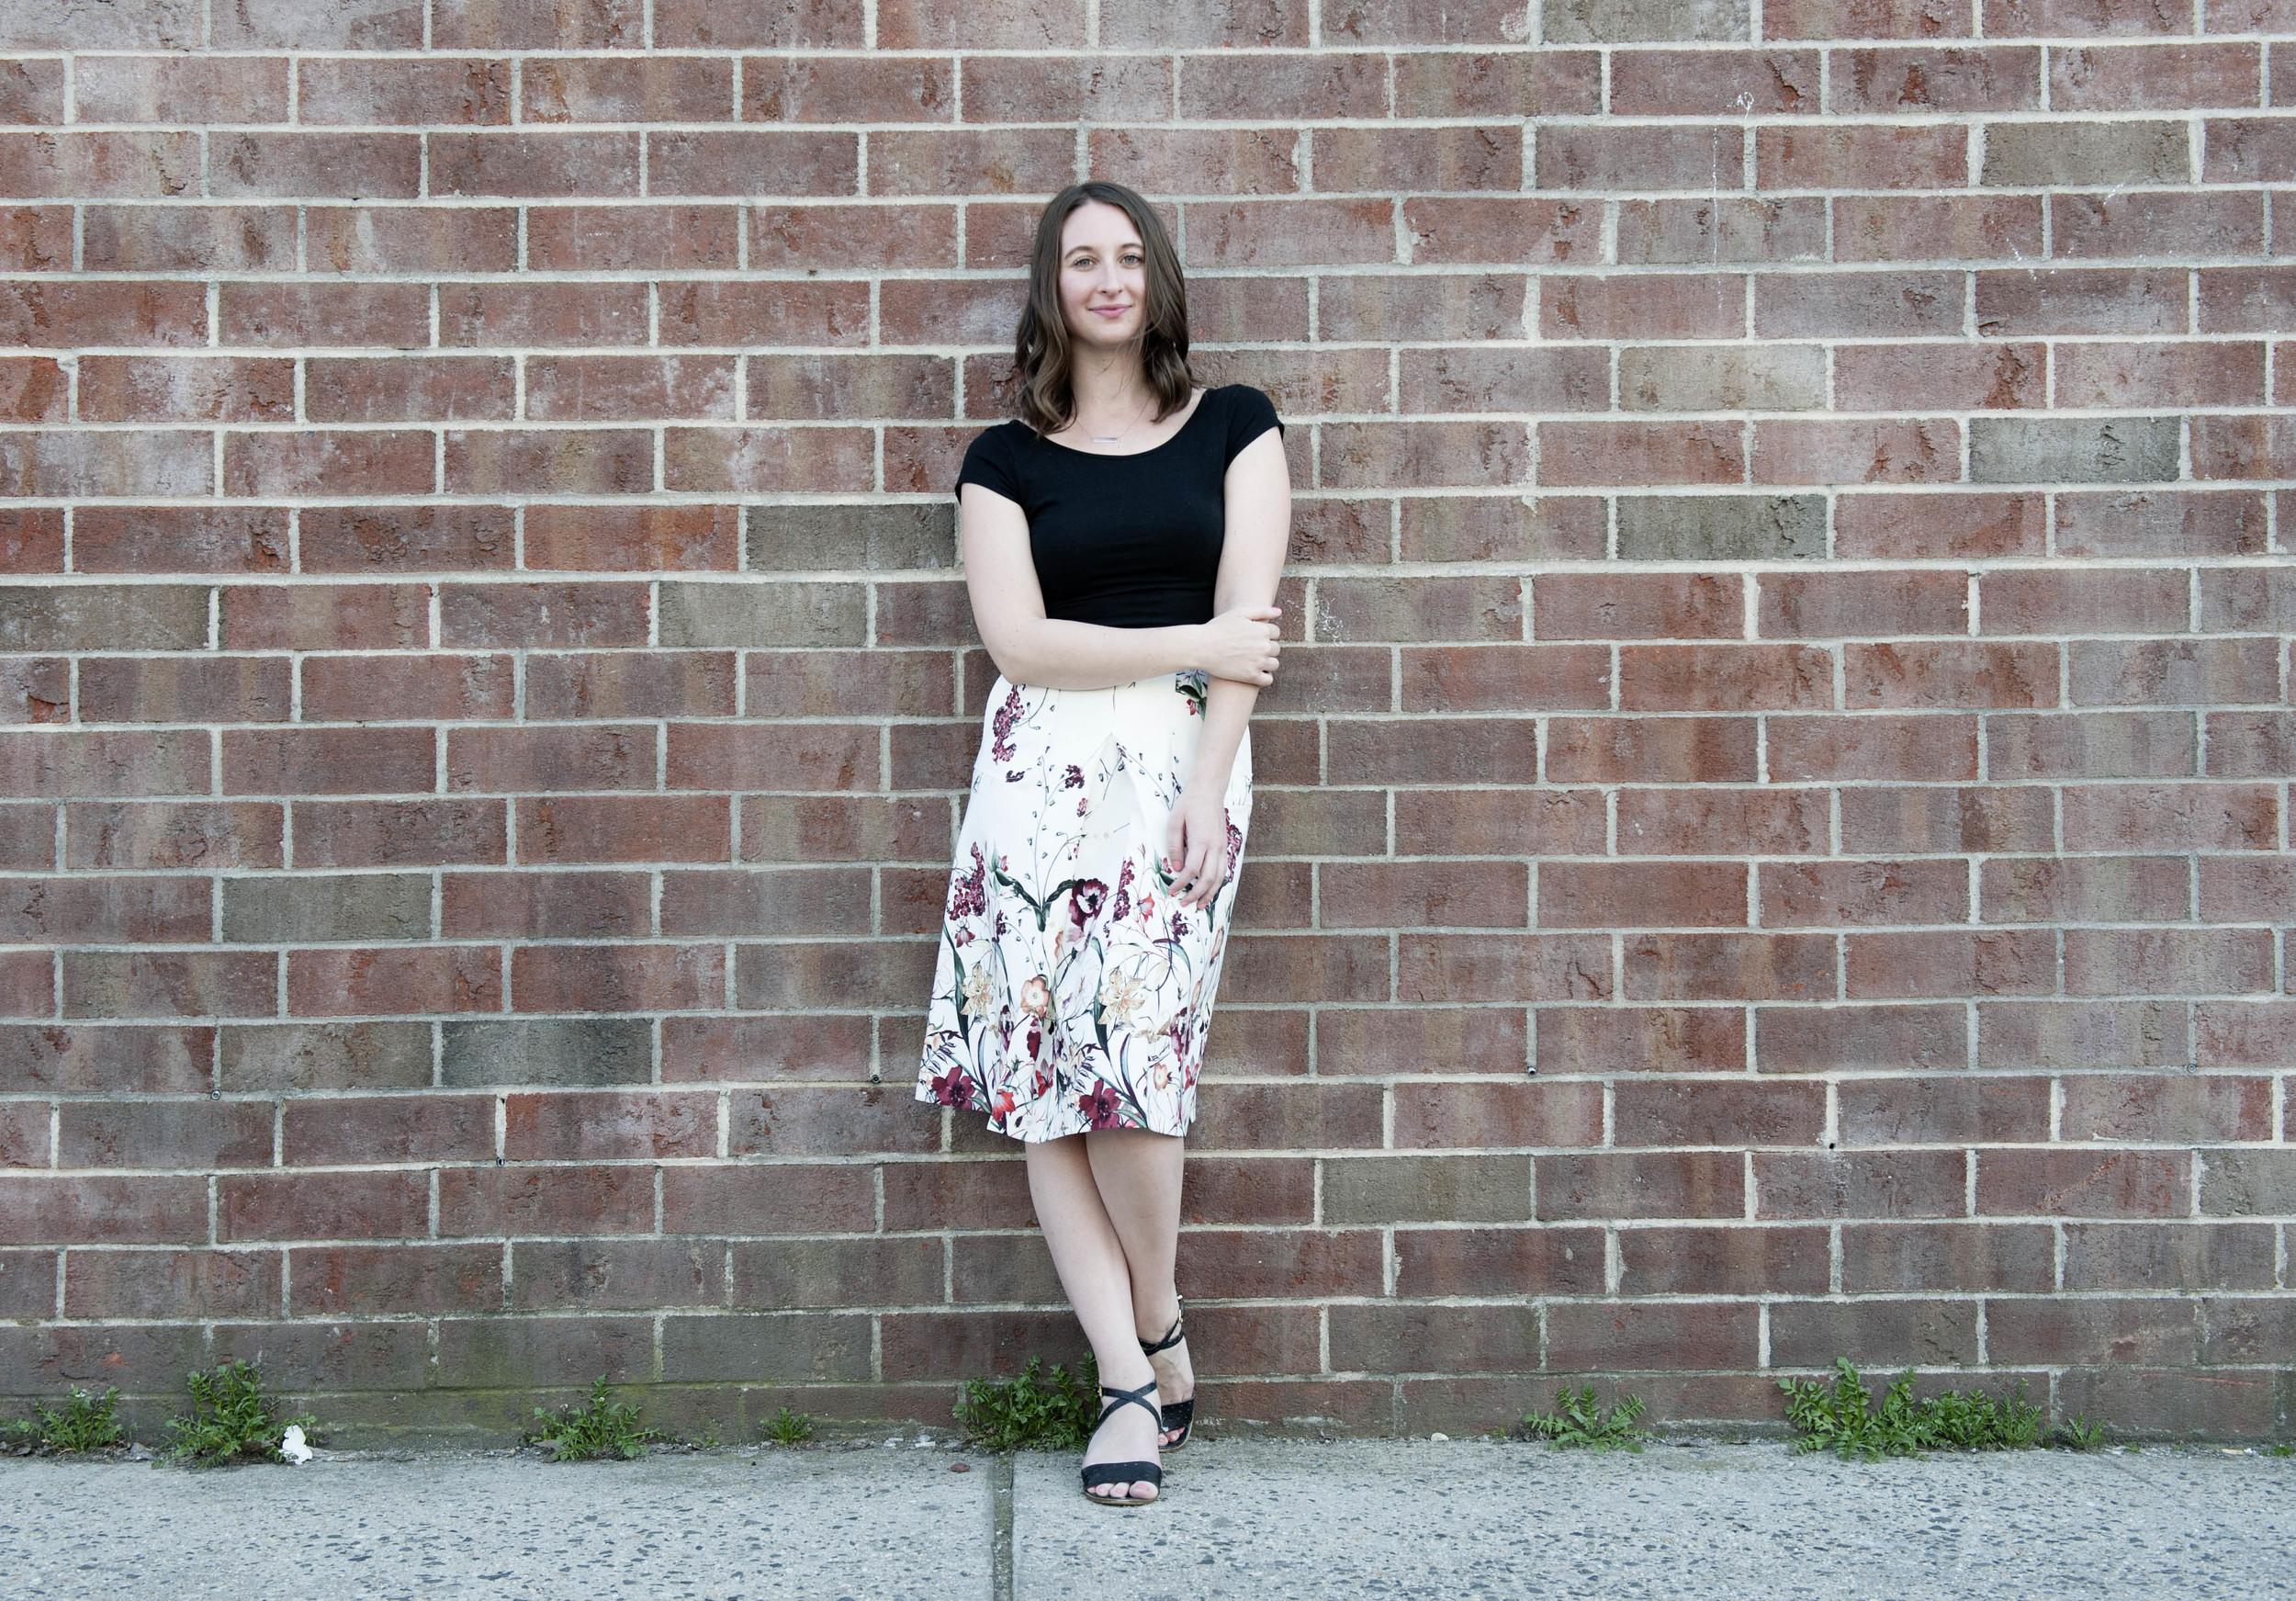 Refinery29's feature's writer, Vanessa Golembewski.